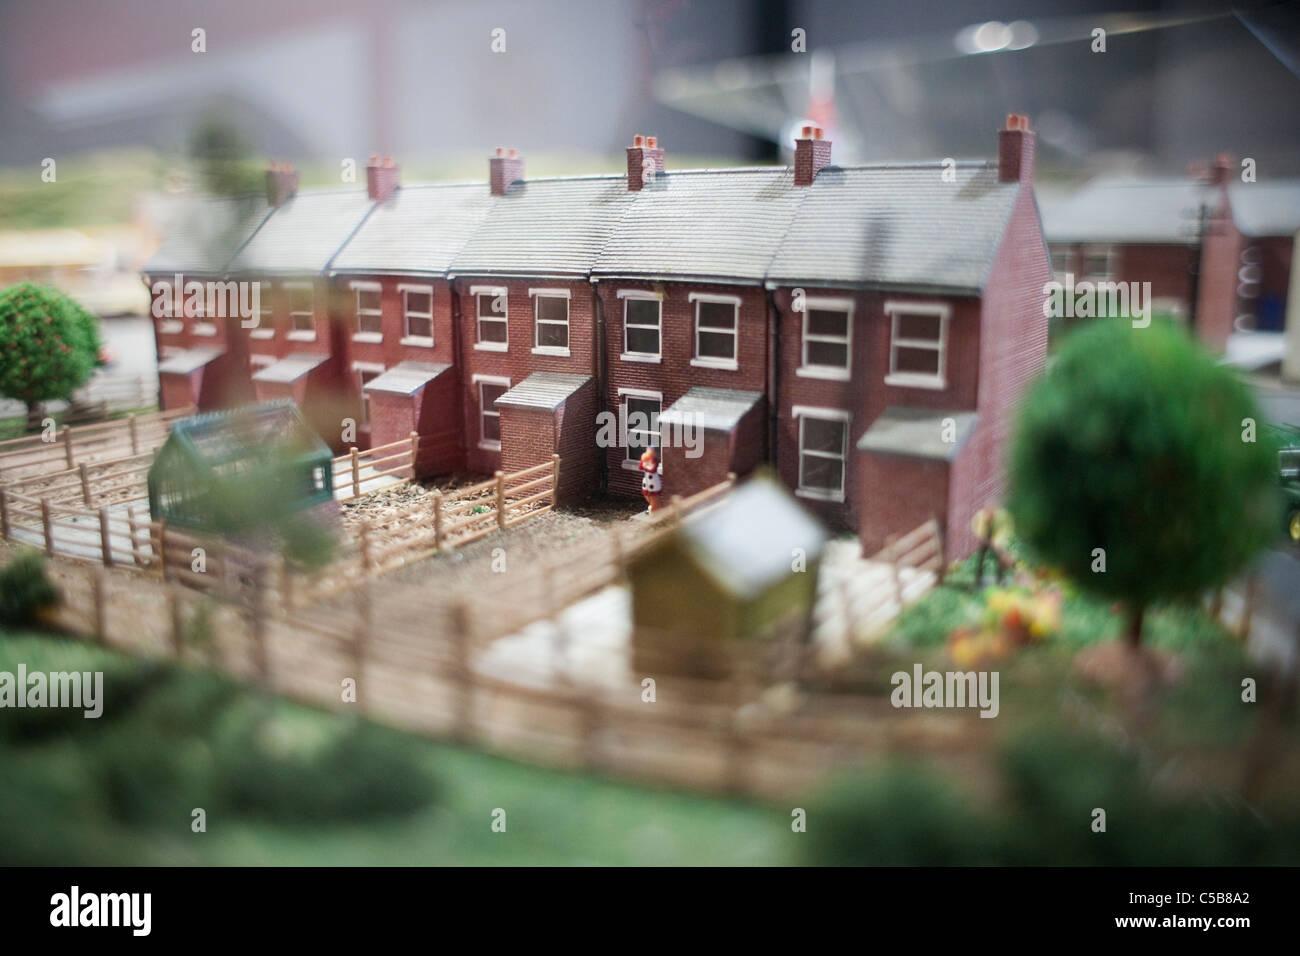 Row of model houses - Stock Image